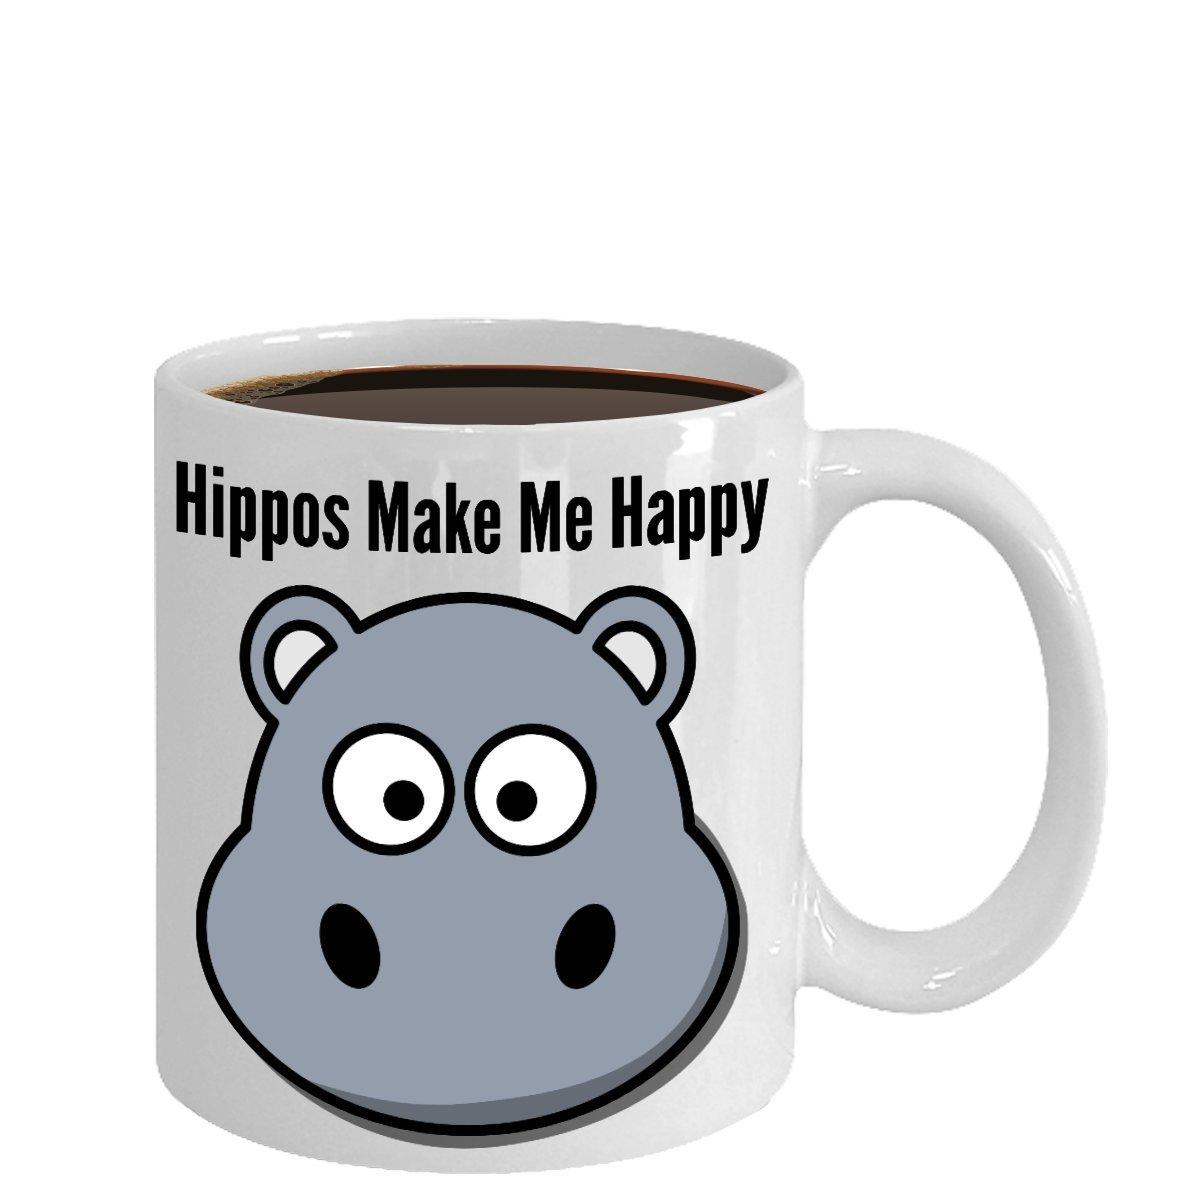 Amazon.com: Hippo Mug - Hippos Make Me Happy - Cute Hippo Gift for ...